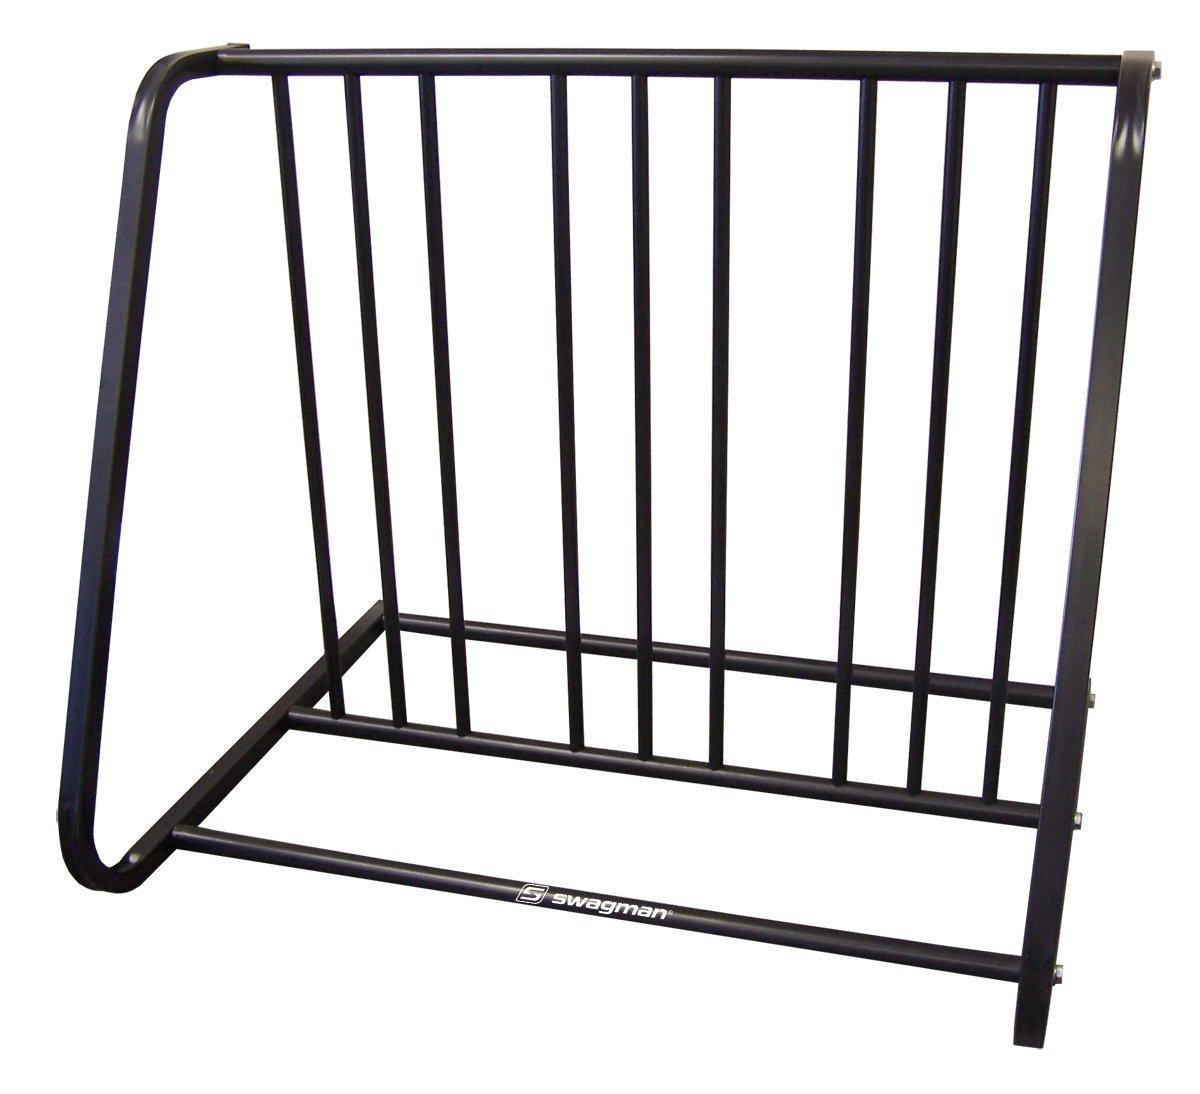 Swagman Park City 6-Bike Rack Stand